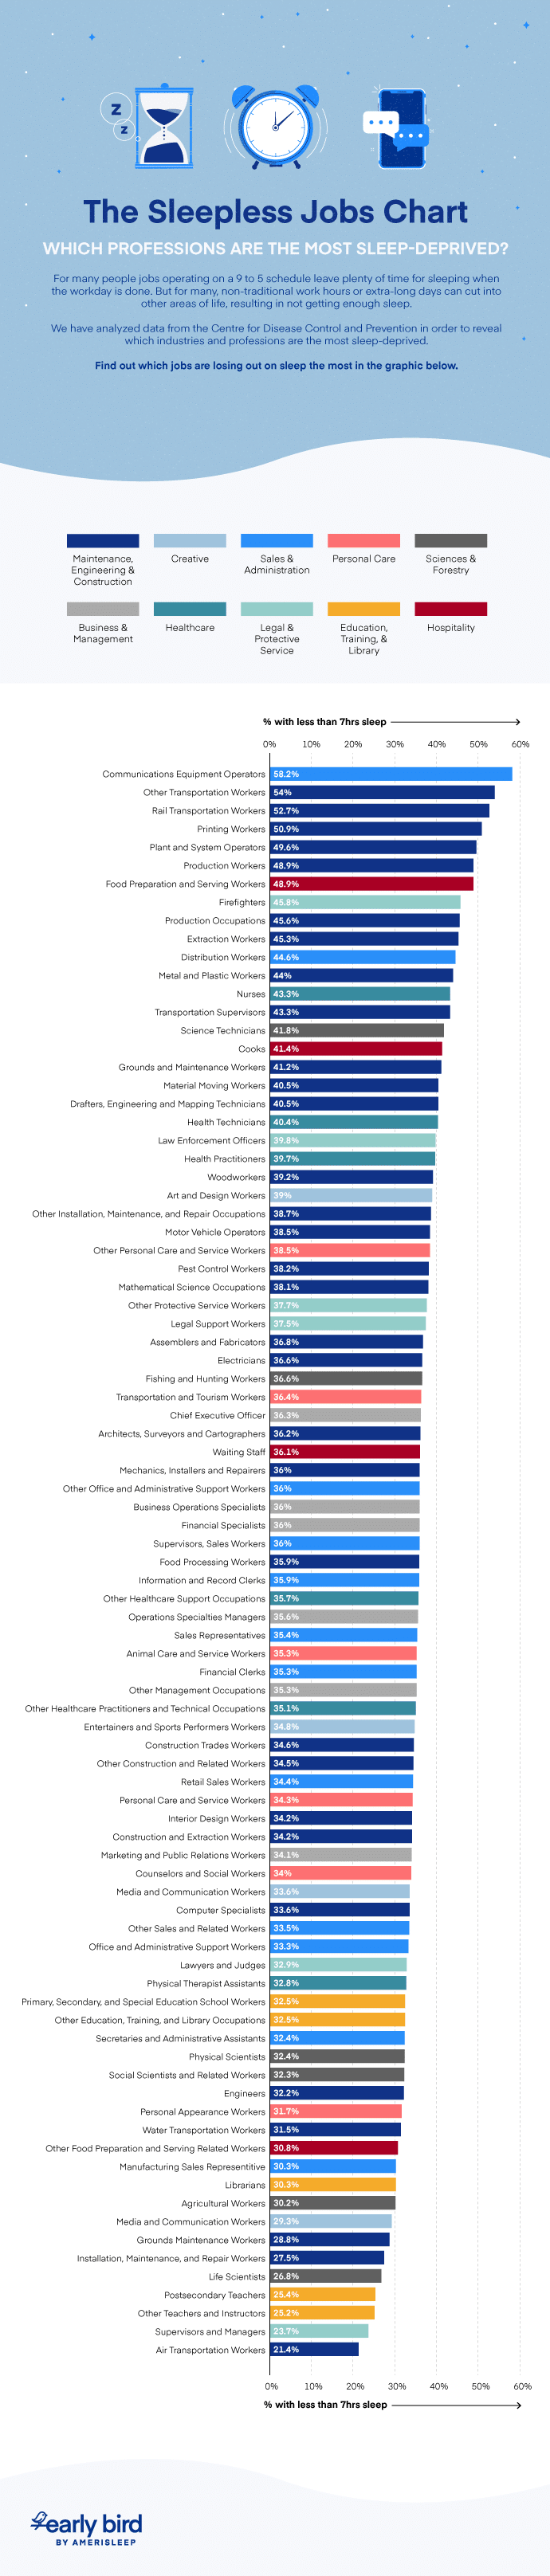 Sleepless job chart